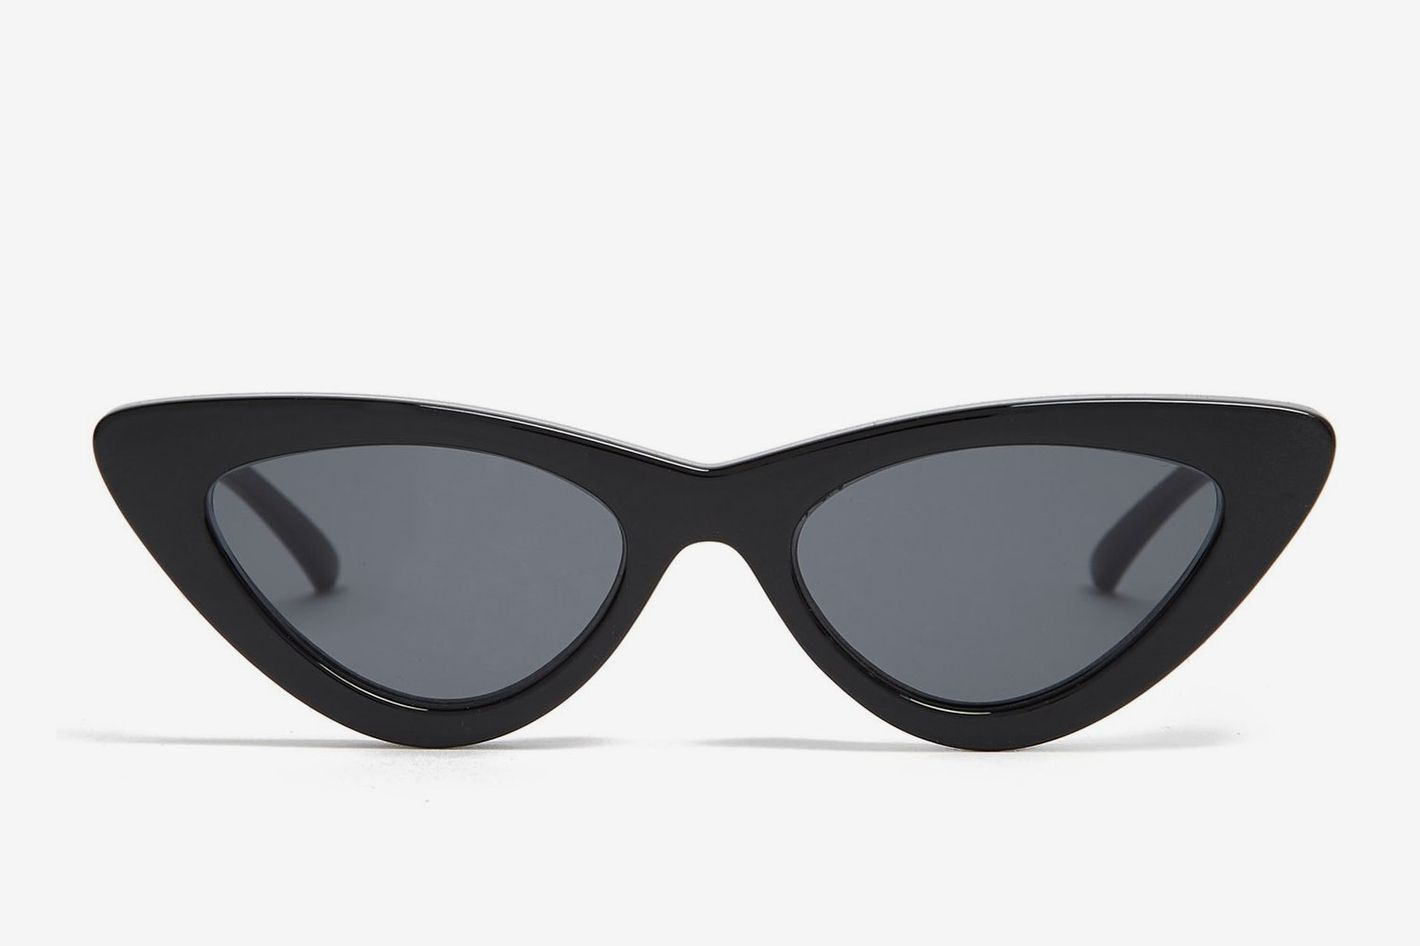 Le Specs The Last Lolita Cat Eye Sunglasses